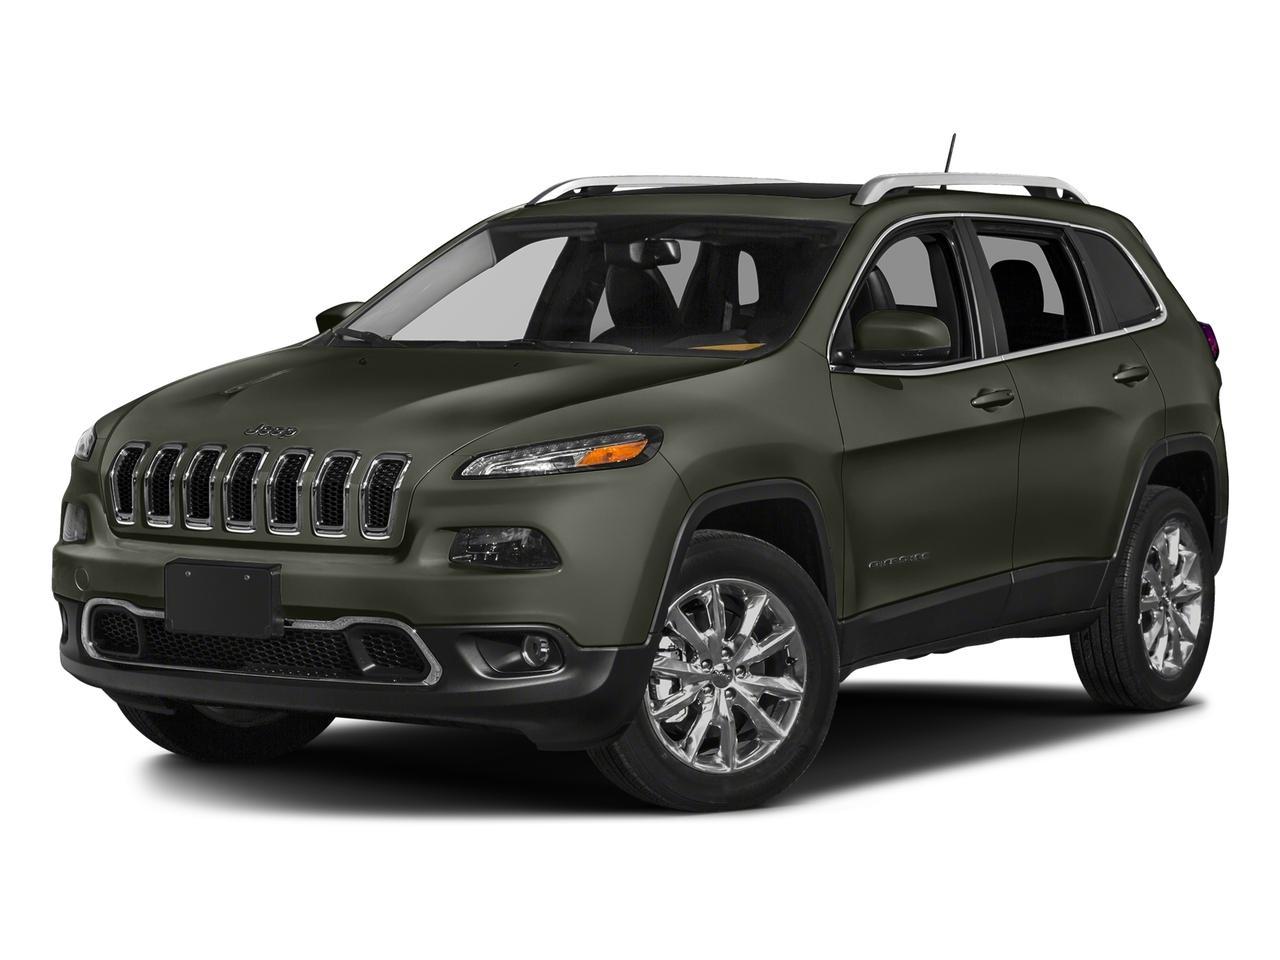 2018 Jeep Cherokee Vehicle Photo in Butler, PA 16002